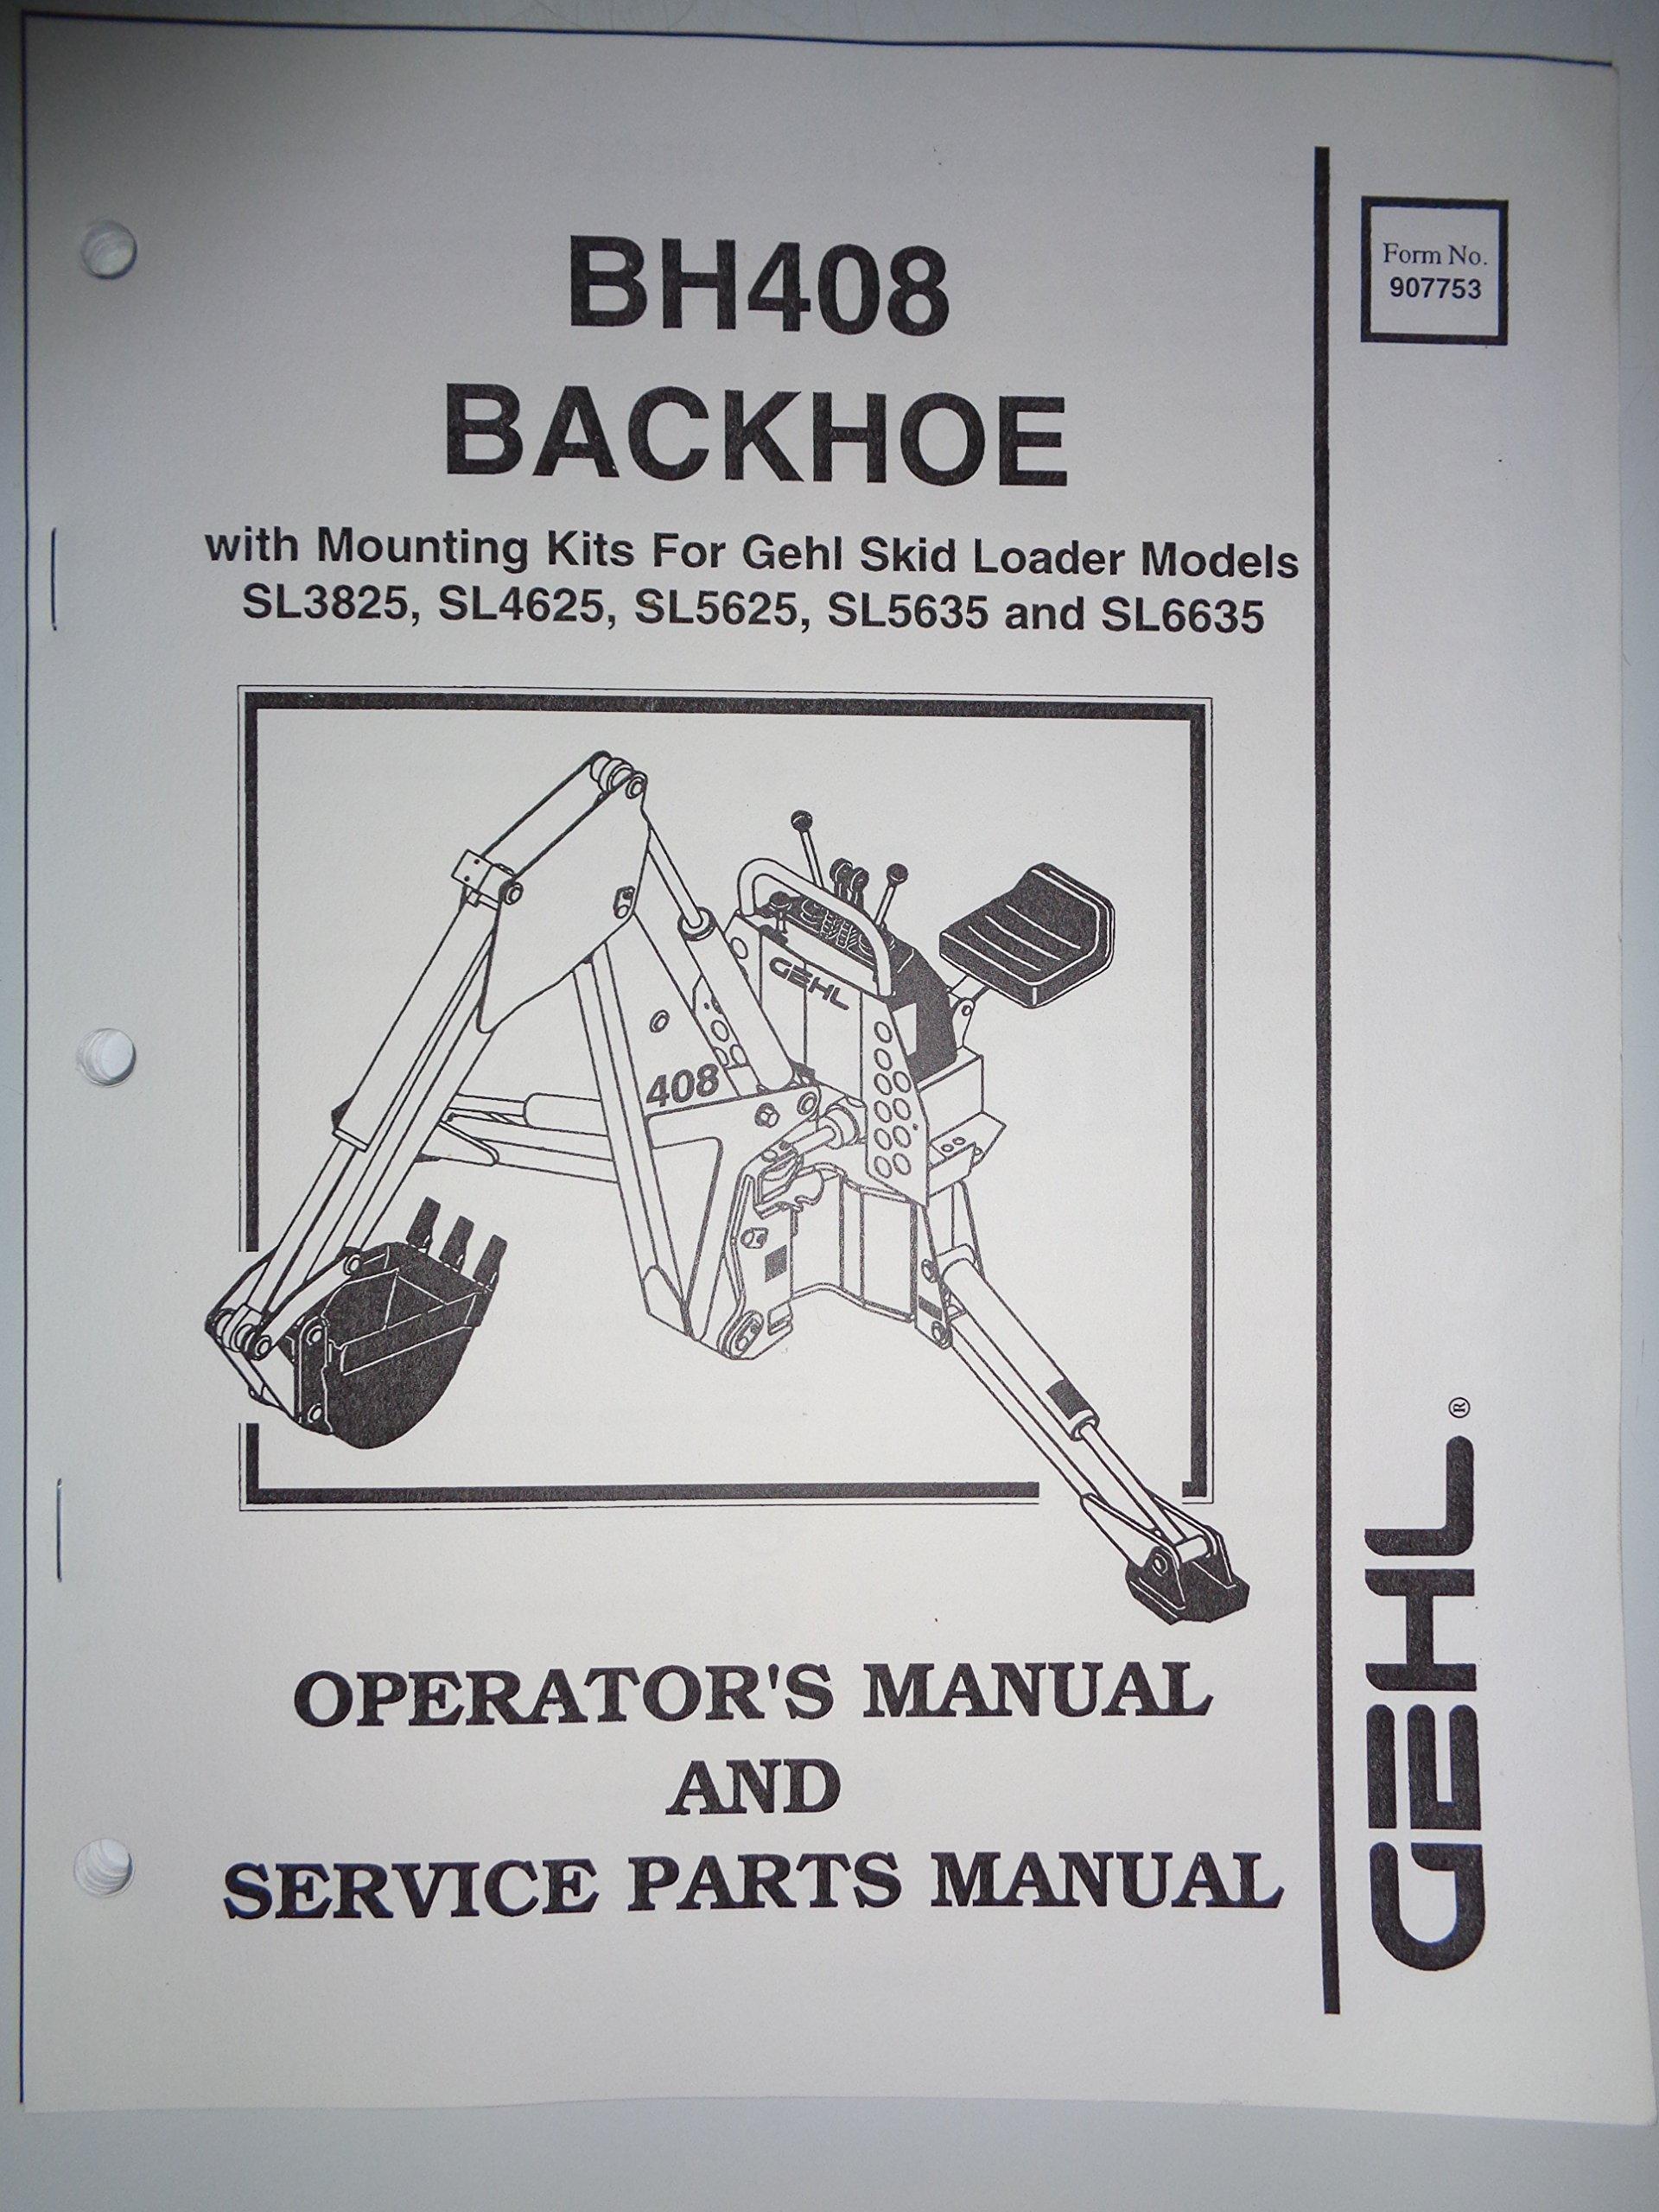 Gehl BH408 Backhoe Parts Operators Owners Manual 5 97 Used